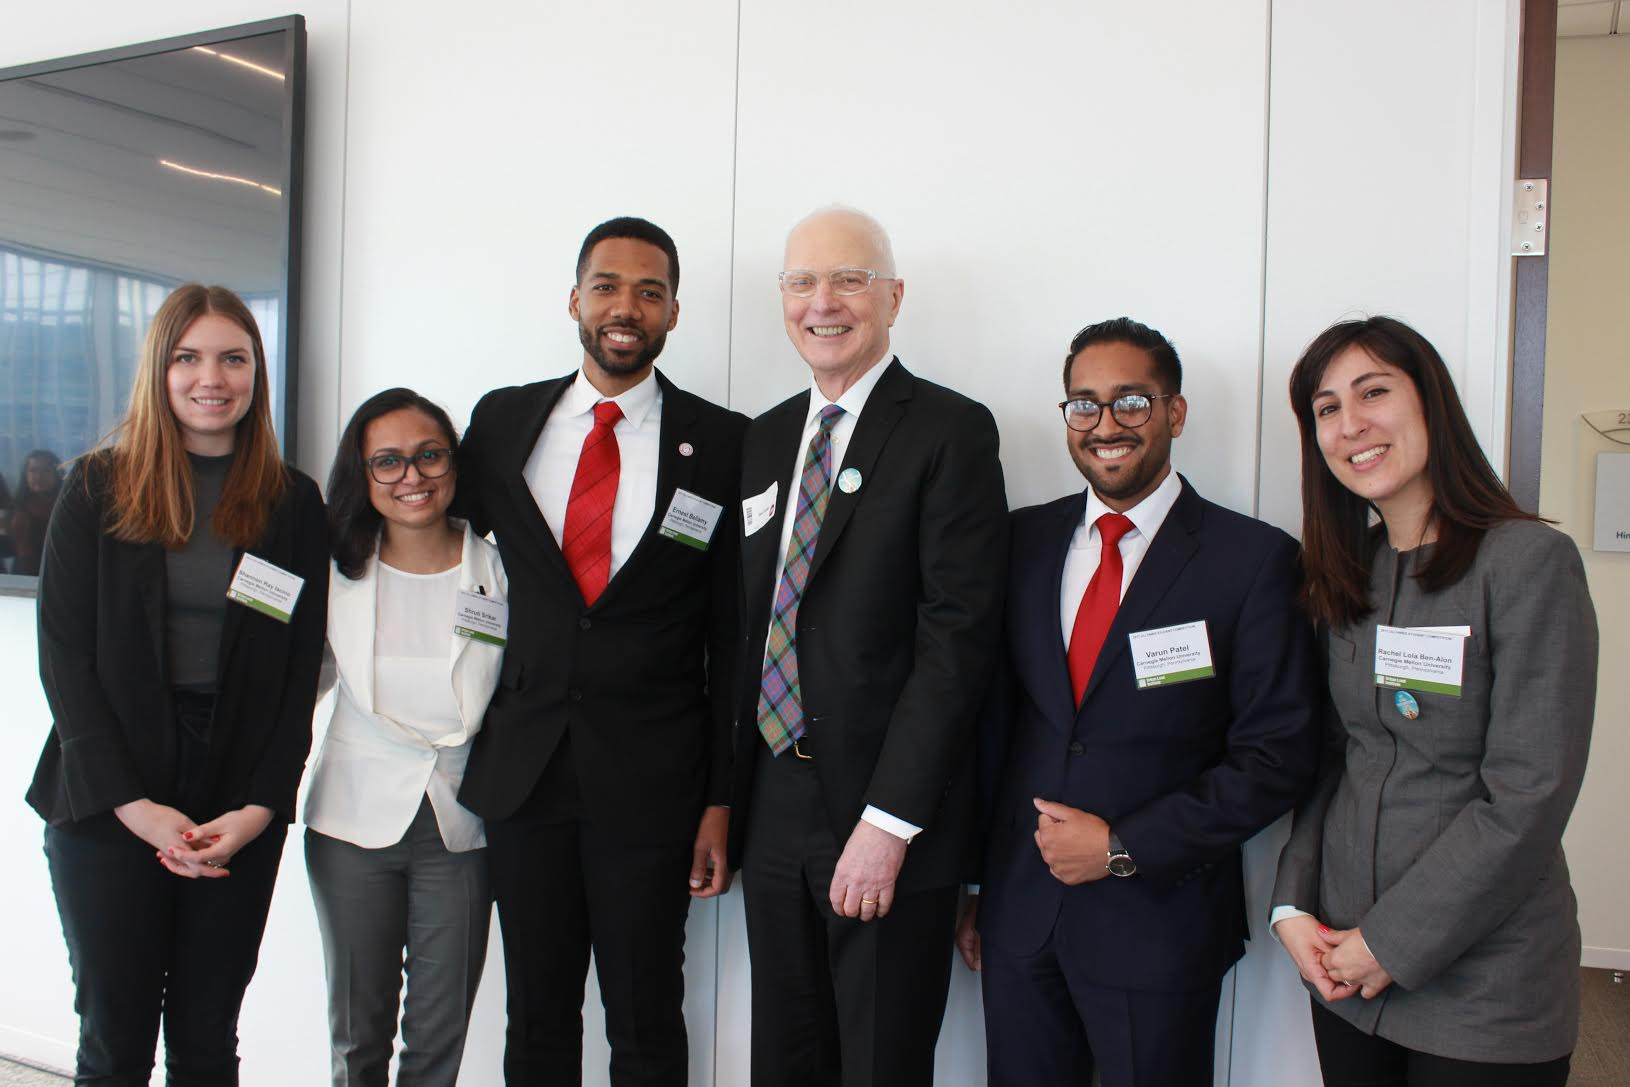 From left to right,team members Shannon Iacino, Shruti Srikar, Ernest Bellamy, Don Carter, Varun Patel, Lola Ben-Alon. Photo credit: Radhika Patel